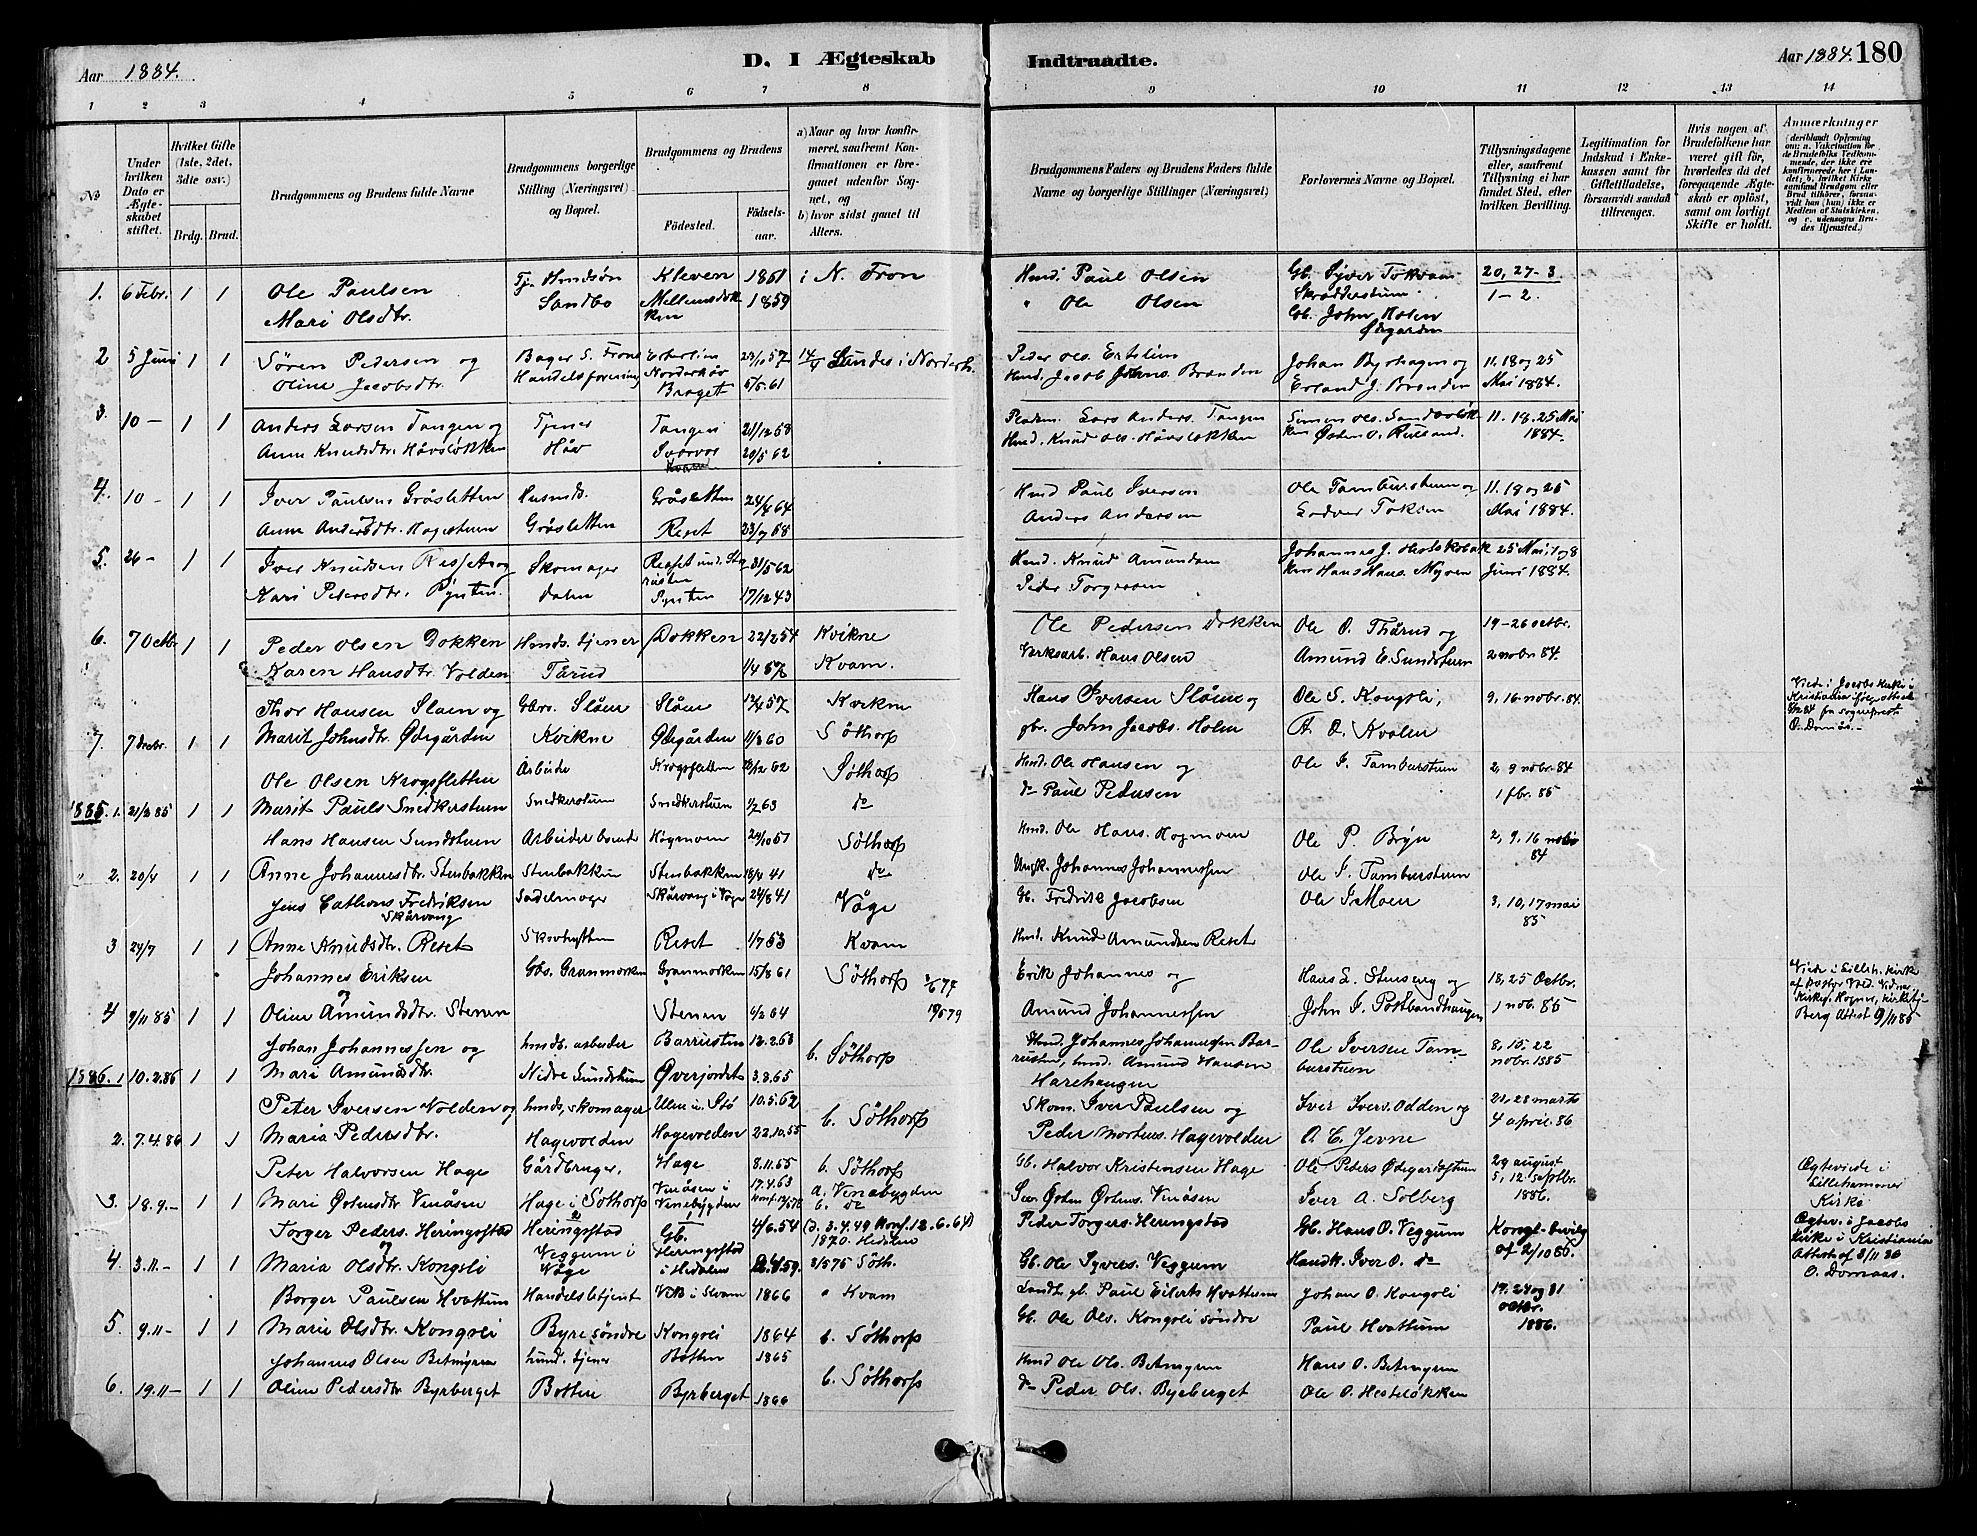 SAH, Nord-Fron prestekontor, Klokkerbok nr. 4, 1884-1914, s. 180